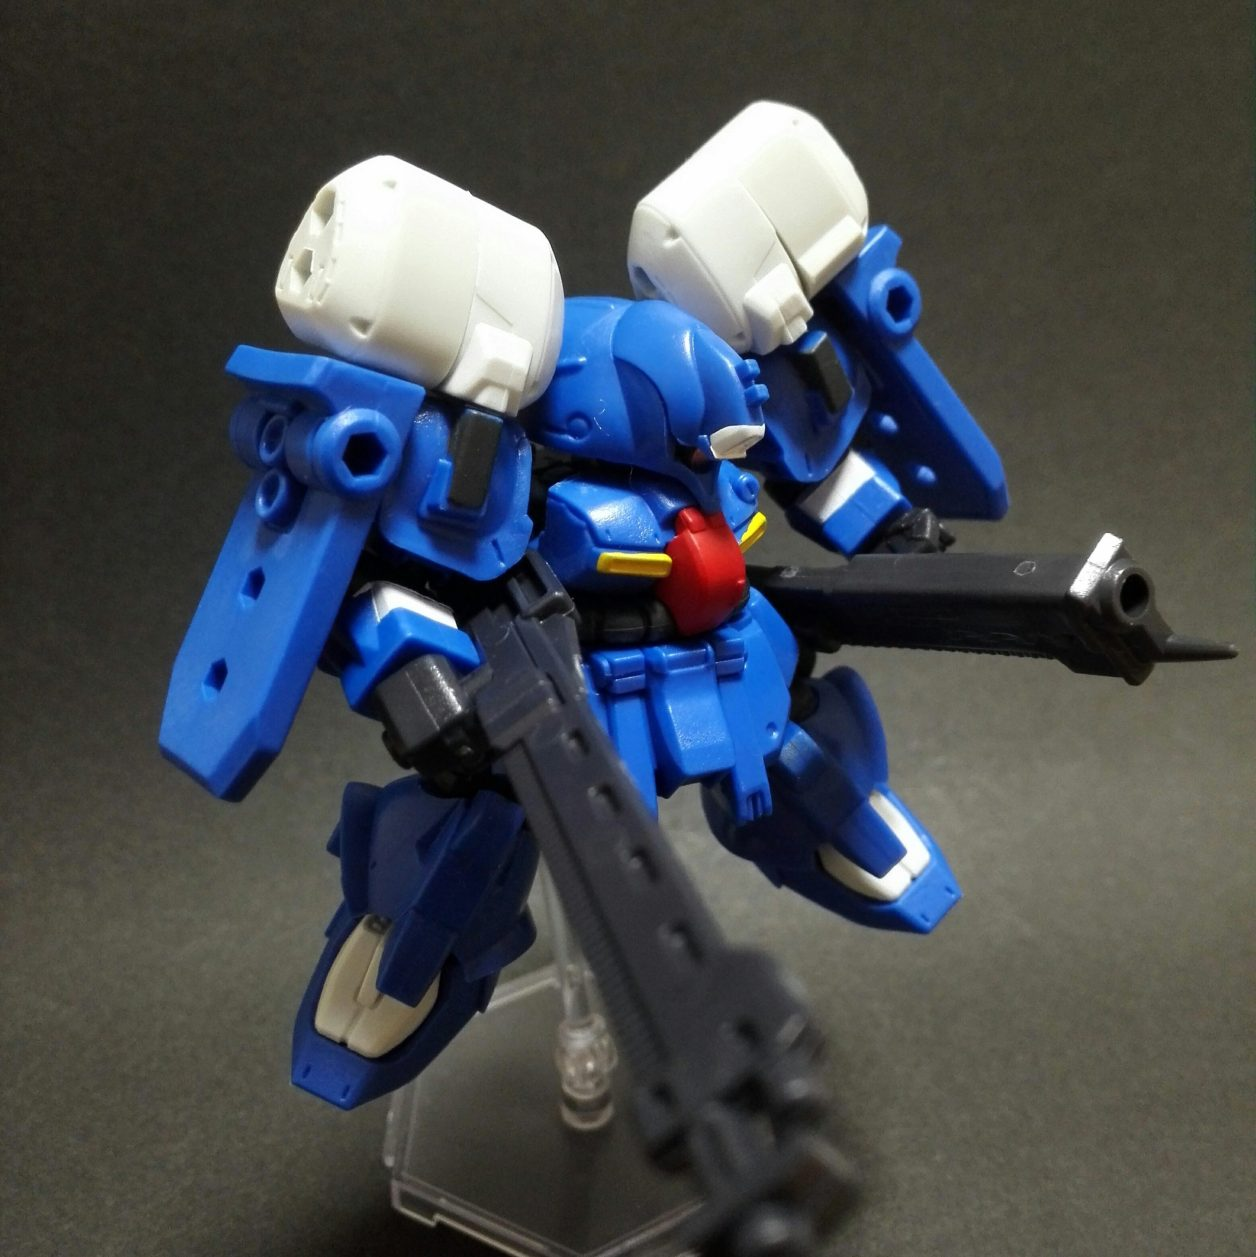 mobile suit ensemble 13弾 ゼクアインとMS武器セットの組み合わせよりゼクアイン第3種兵装のディスプレイ画像